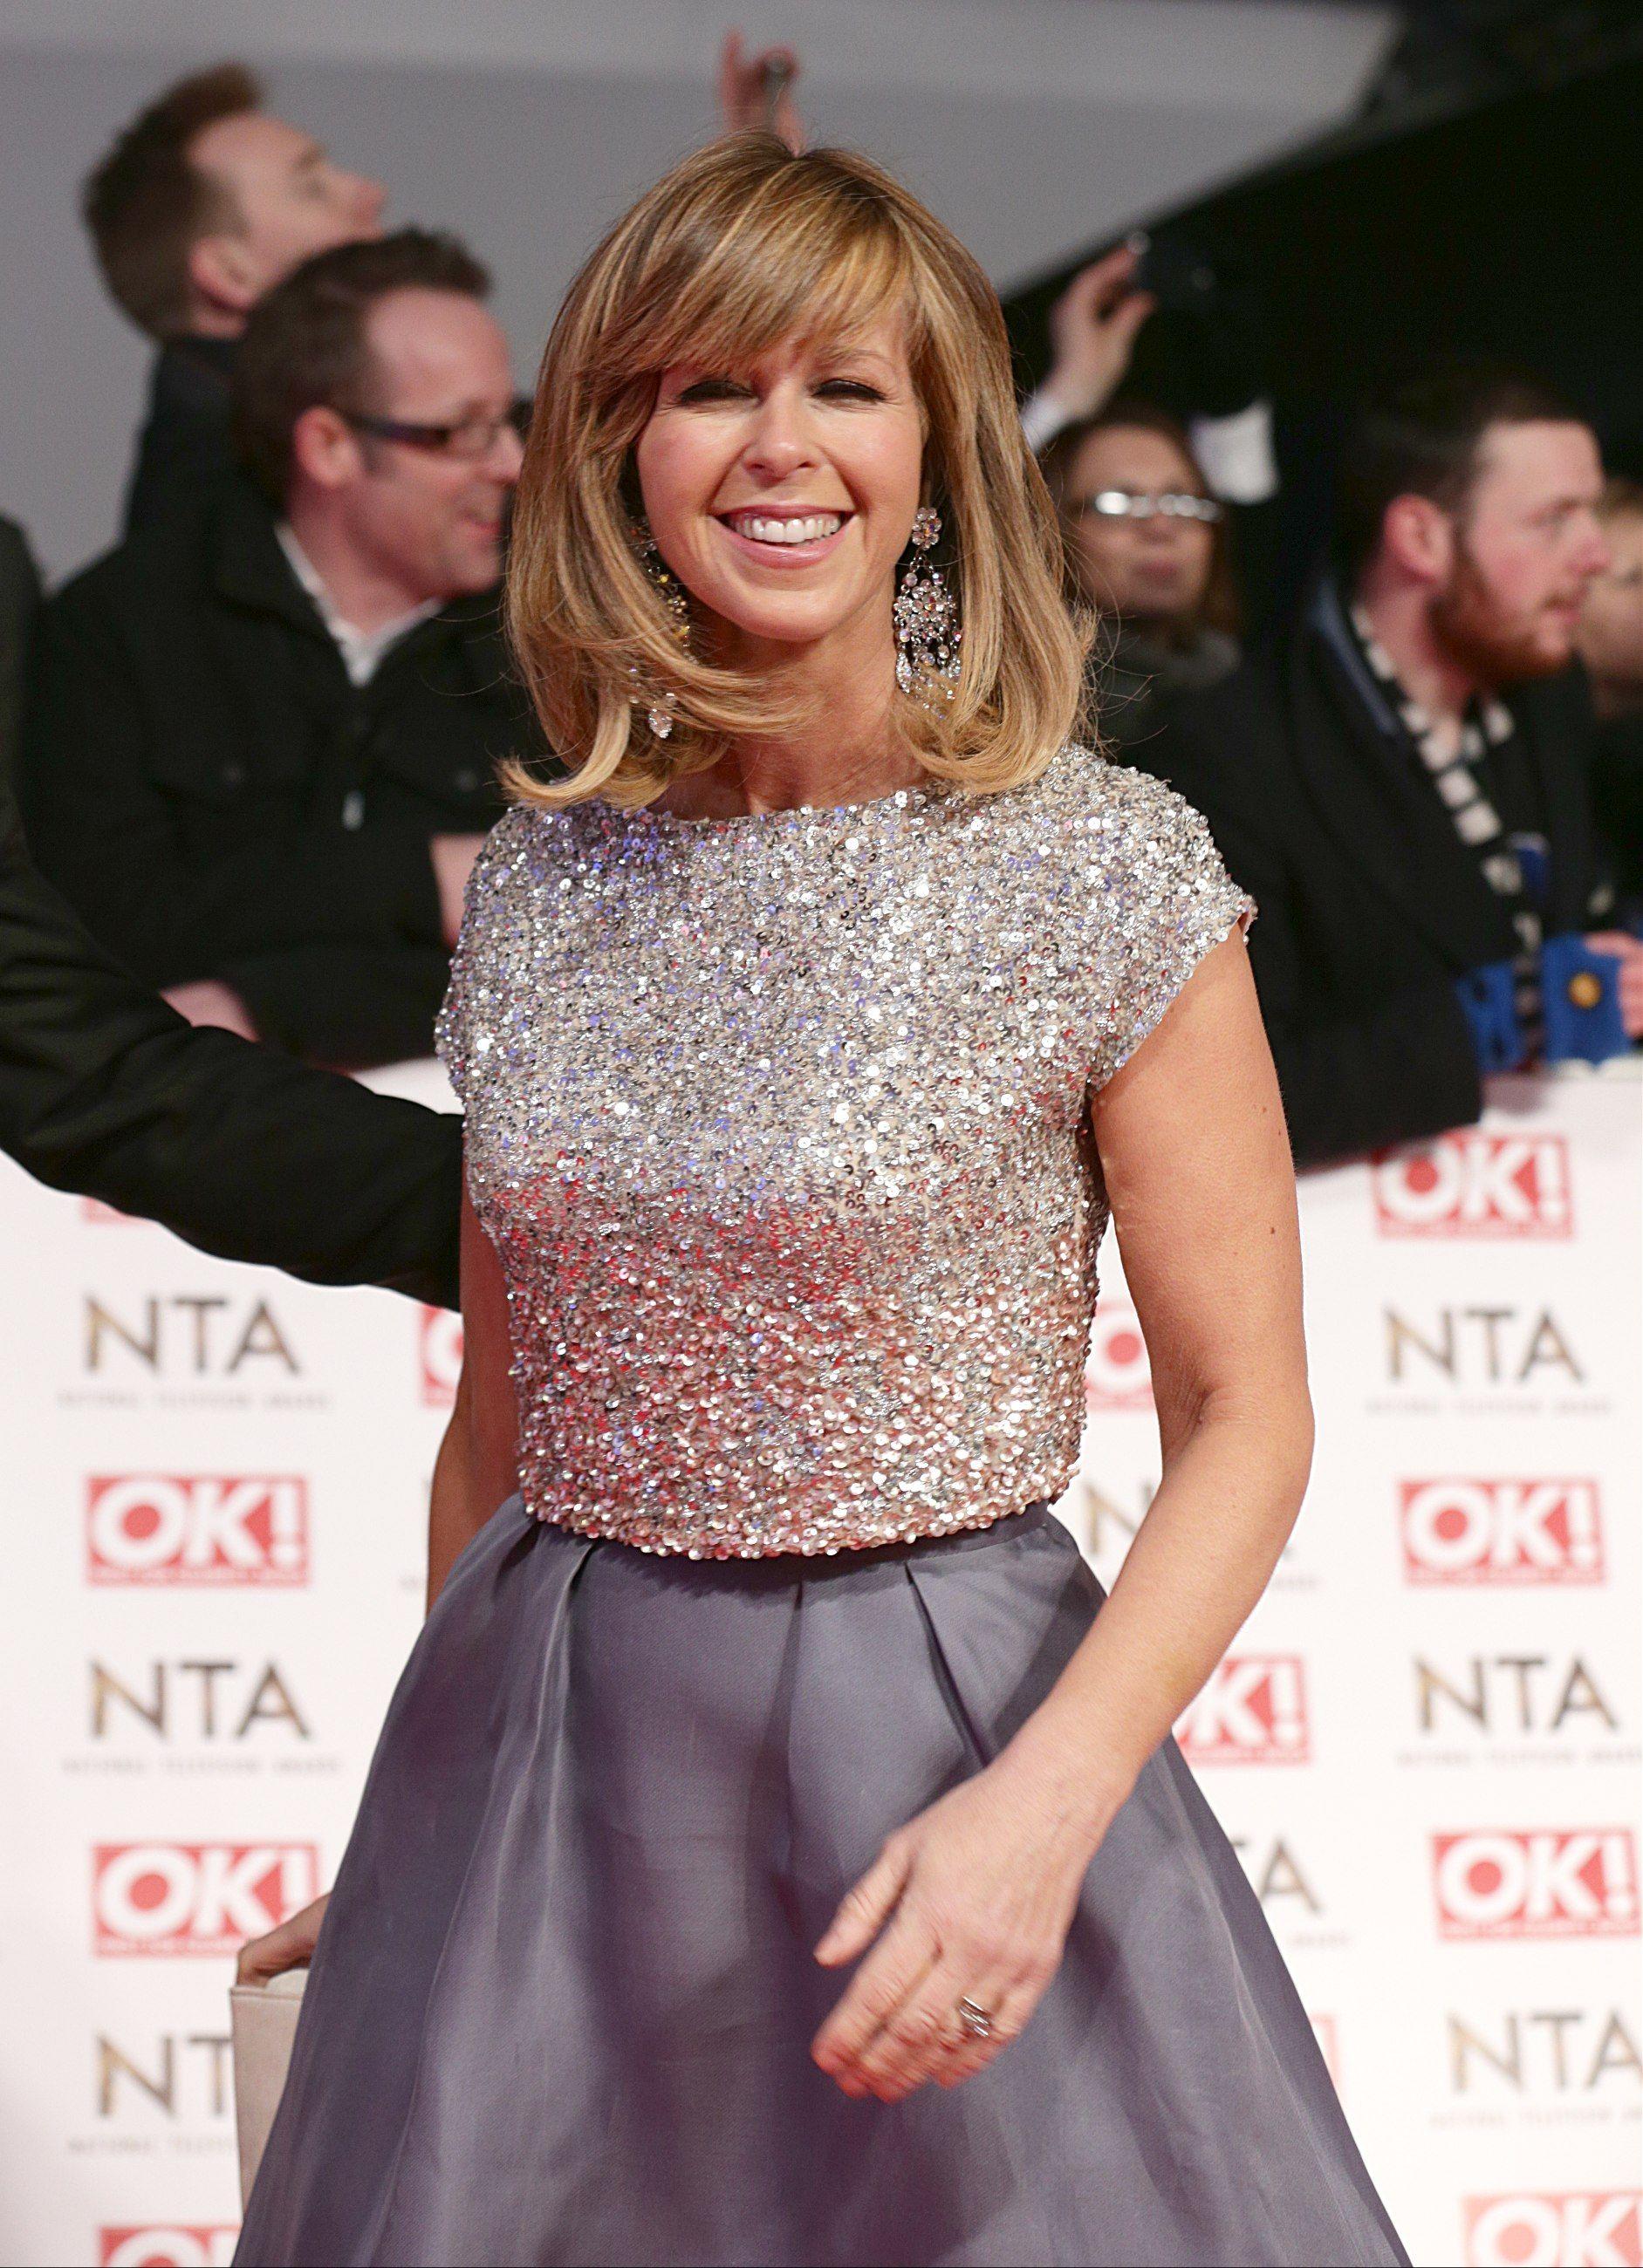 kate garraway – national television awards in london 21.01.15